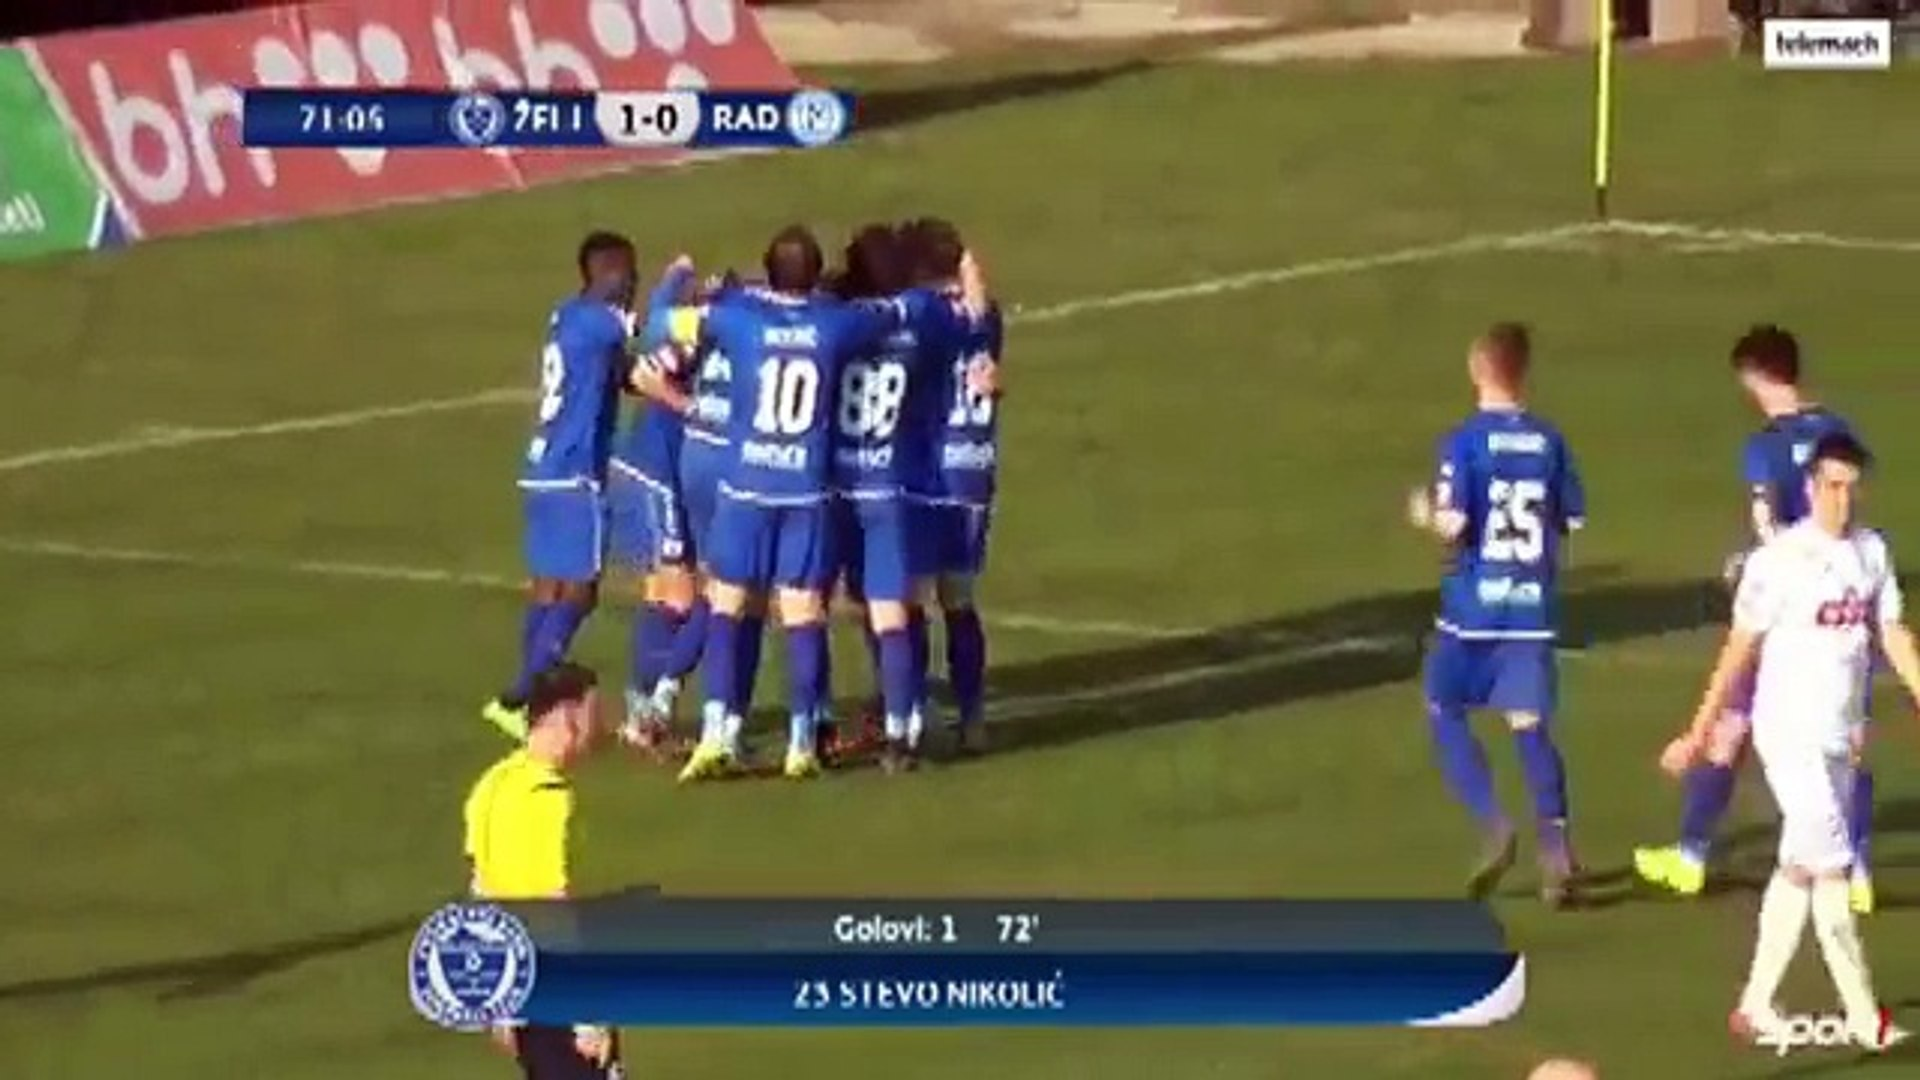 Zeljeznicar 2:0 Radnik Bijeljina (Bosnian and Herzegovian Cup. 15 March 2017)